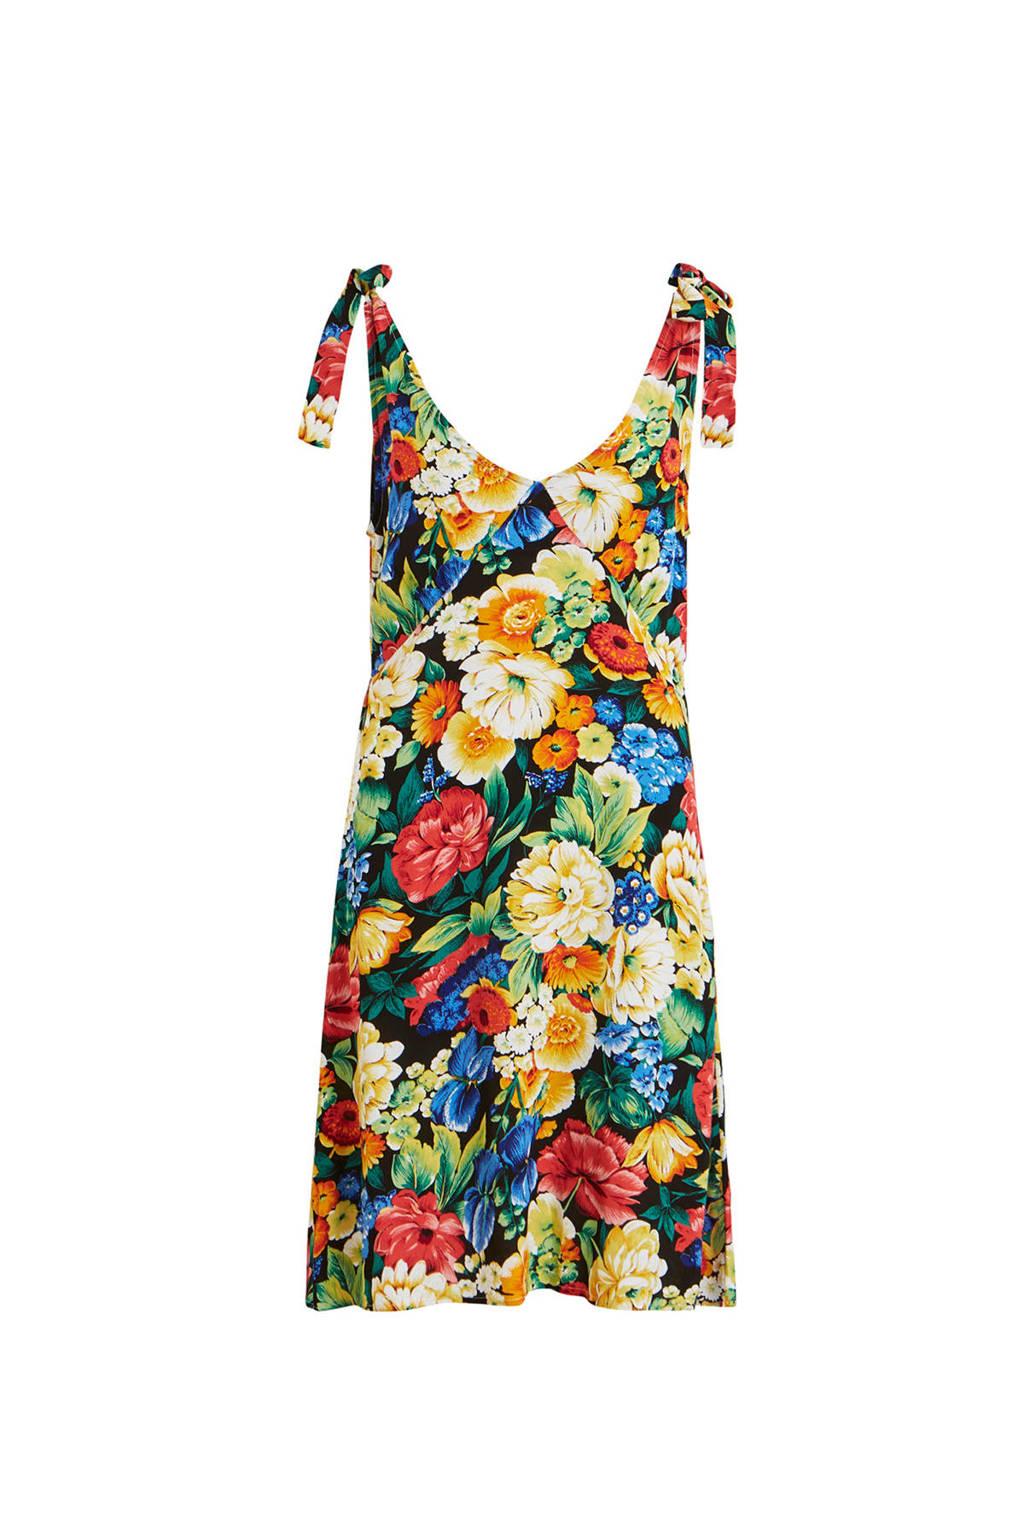 OBJECT gebloemde jurk met knoopdetails, Multi